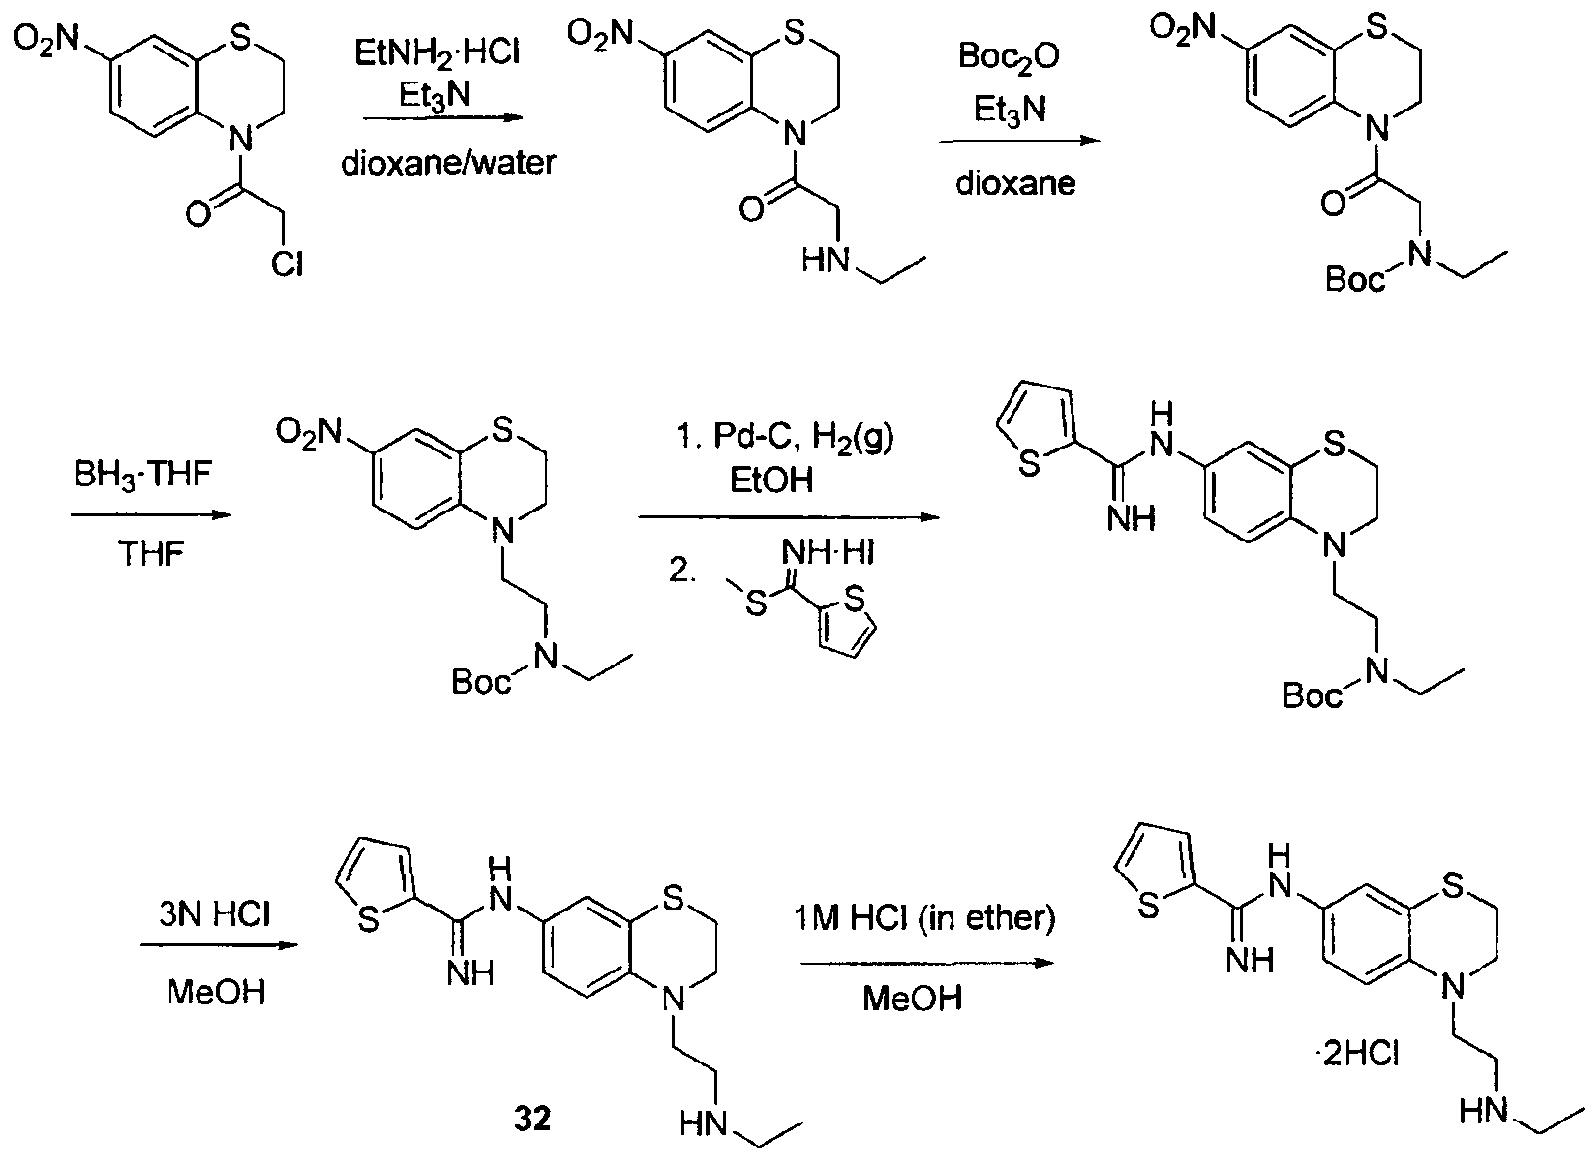 mechanism of salicylamide to iodosalicylamide